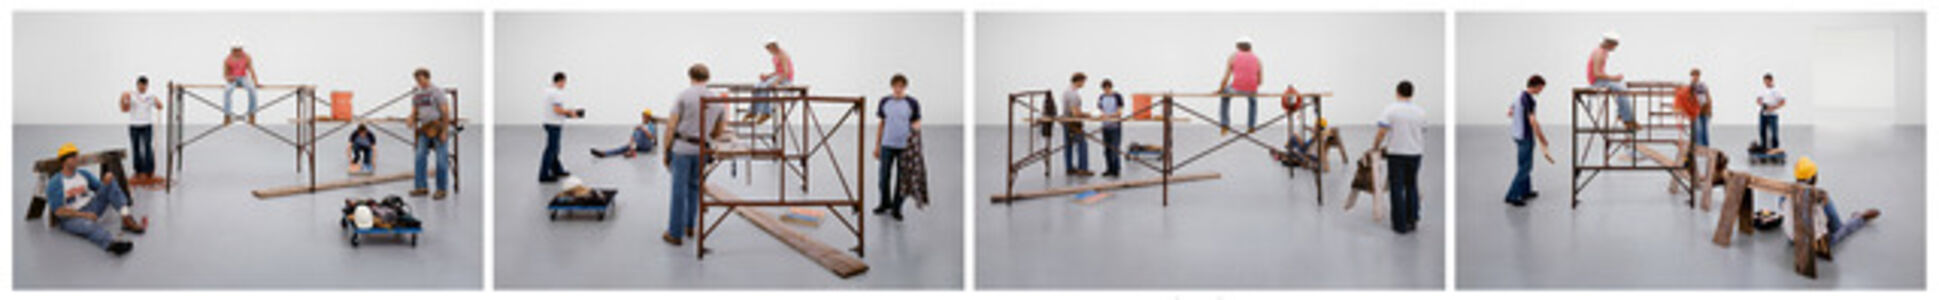 "Sharon Lockhart, 'Lunch Break installation, ""Duane Hanson: Sculptures of Life,"" 14 December 2002- 23 February 2003, Scottish National Gallery of Modern Art', 2003"